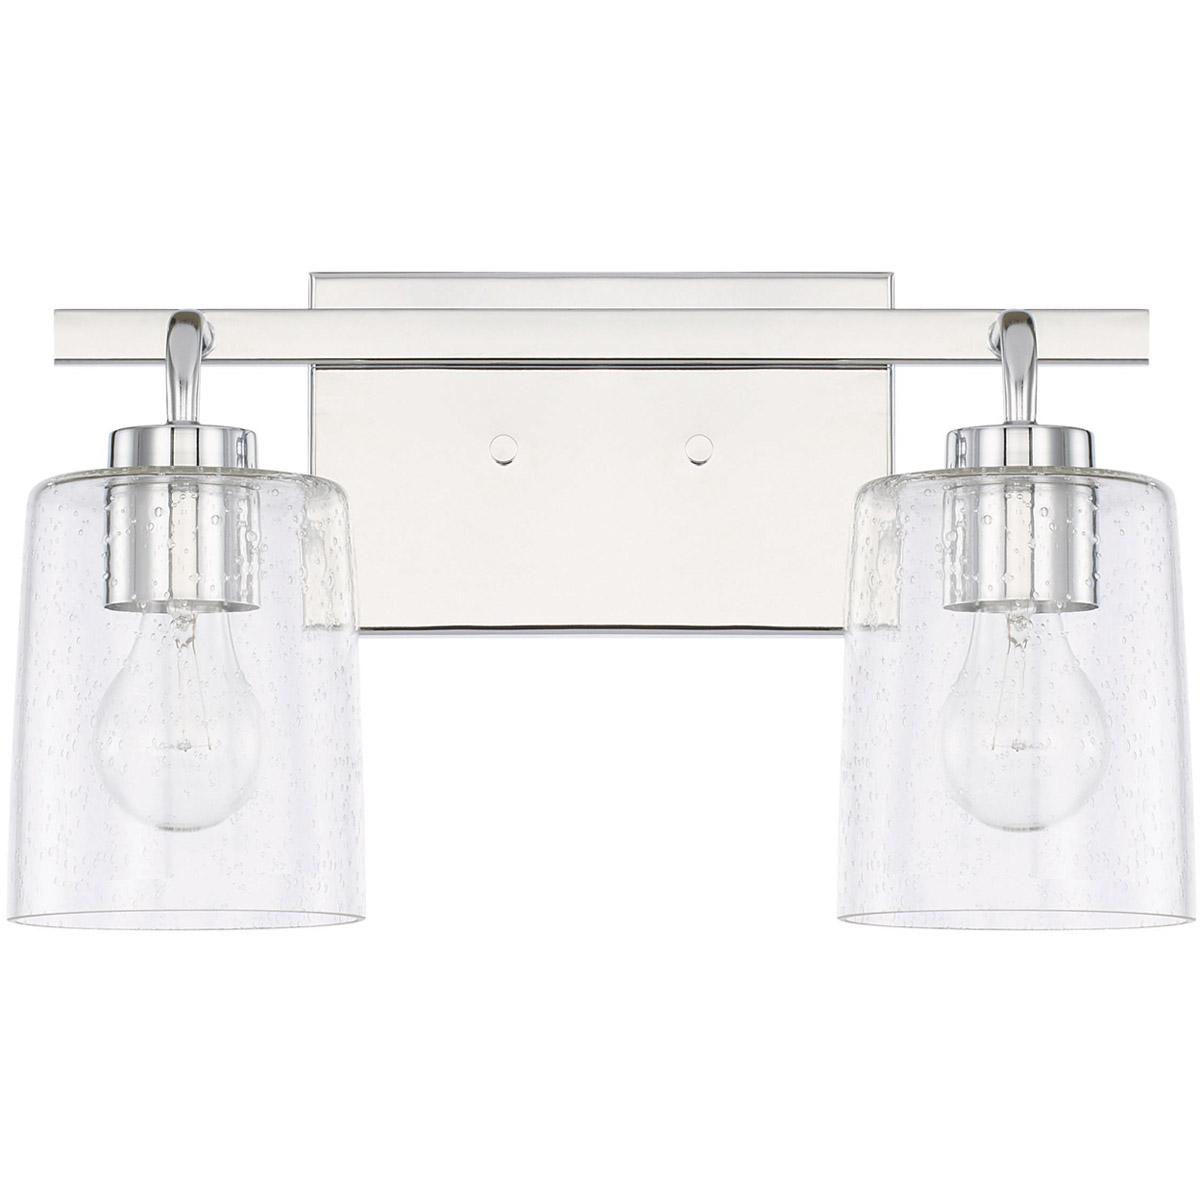 Capital lighting fixtures 128521ch 449 open box greyson bathroom vanity light